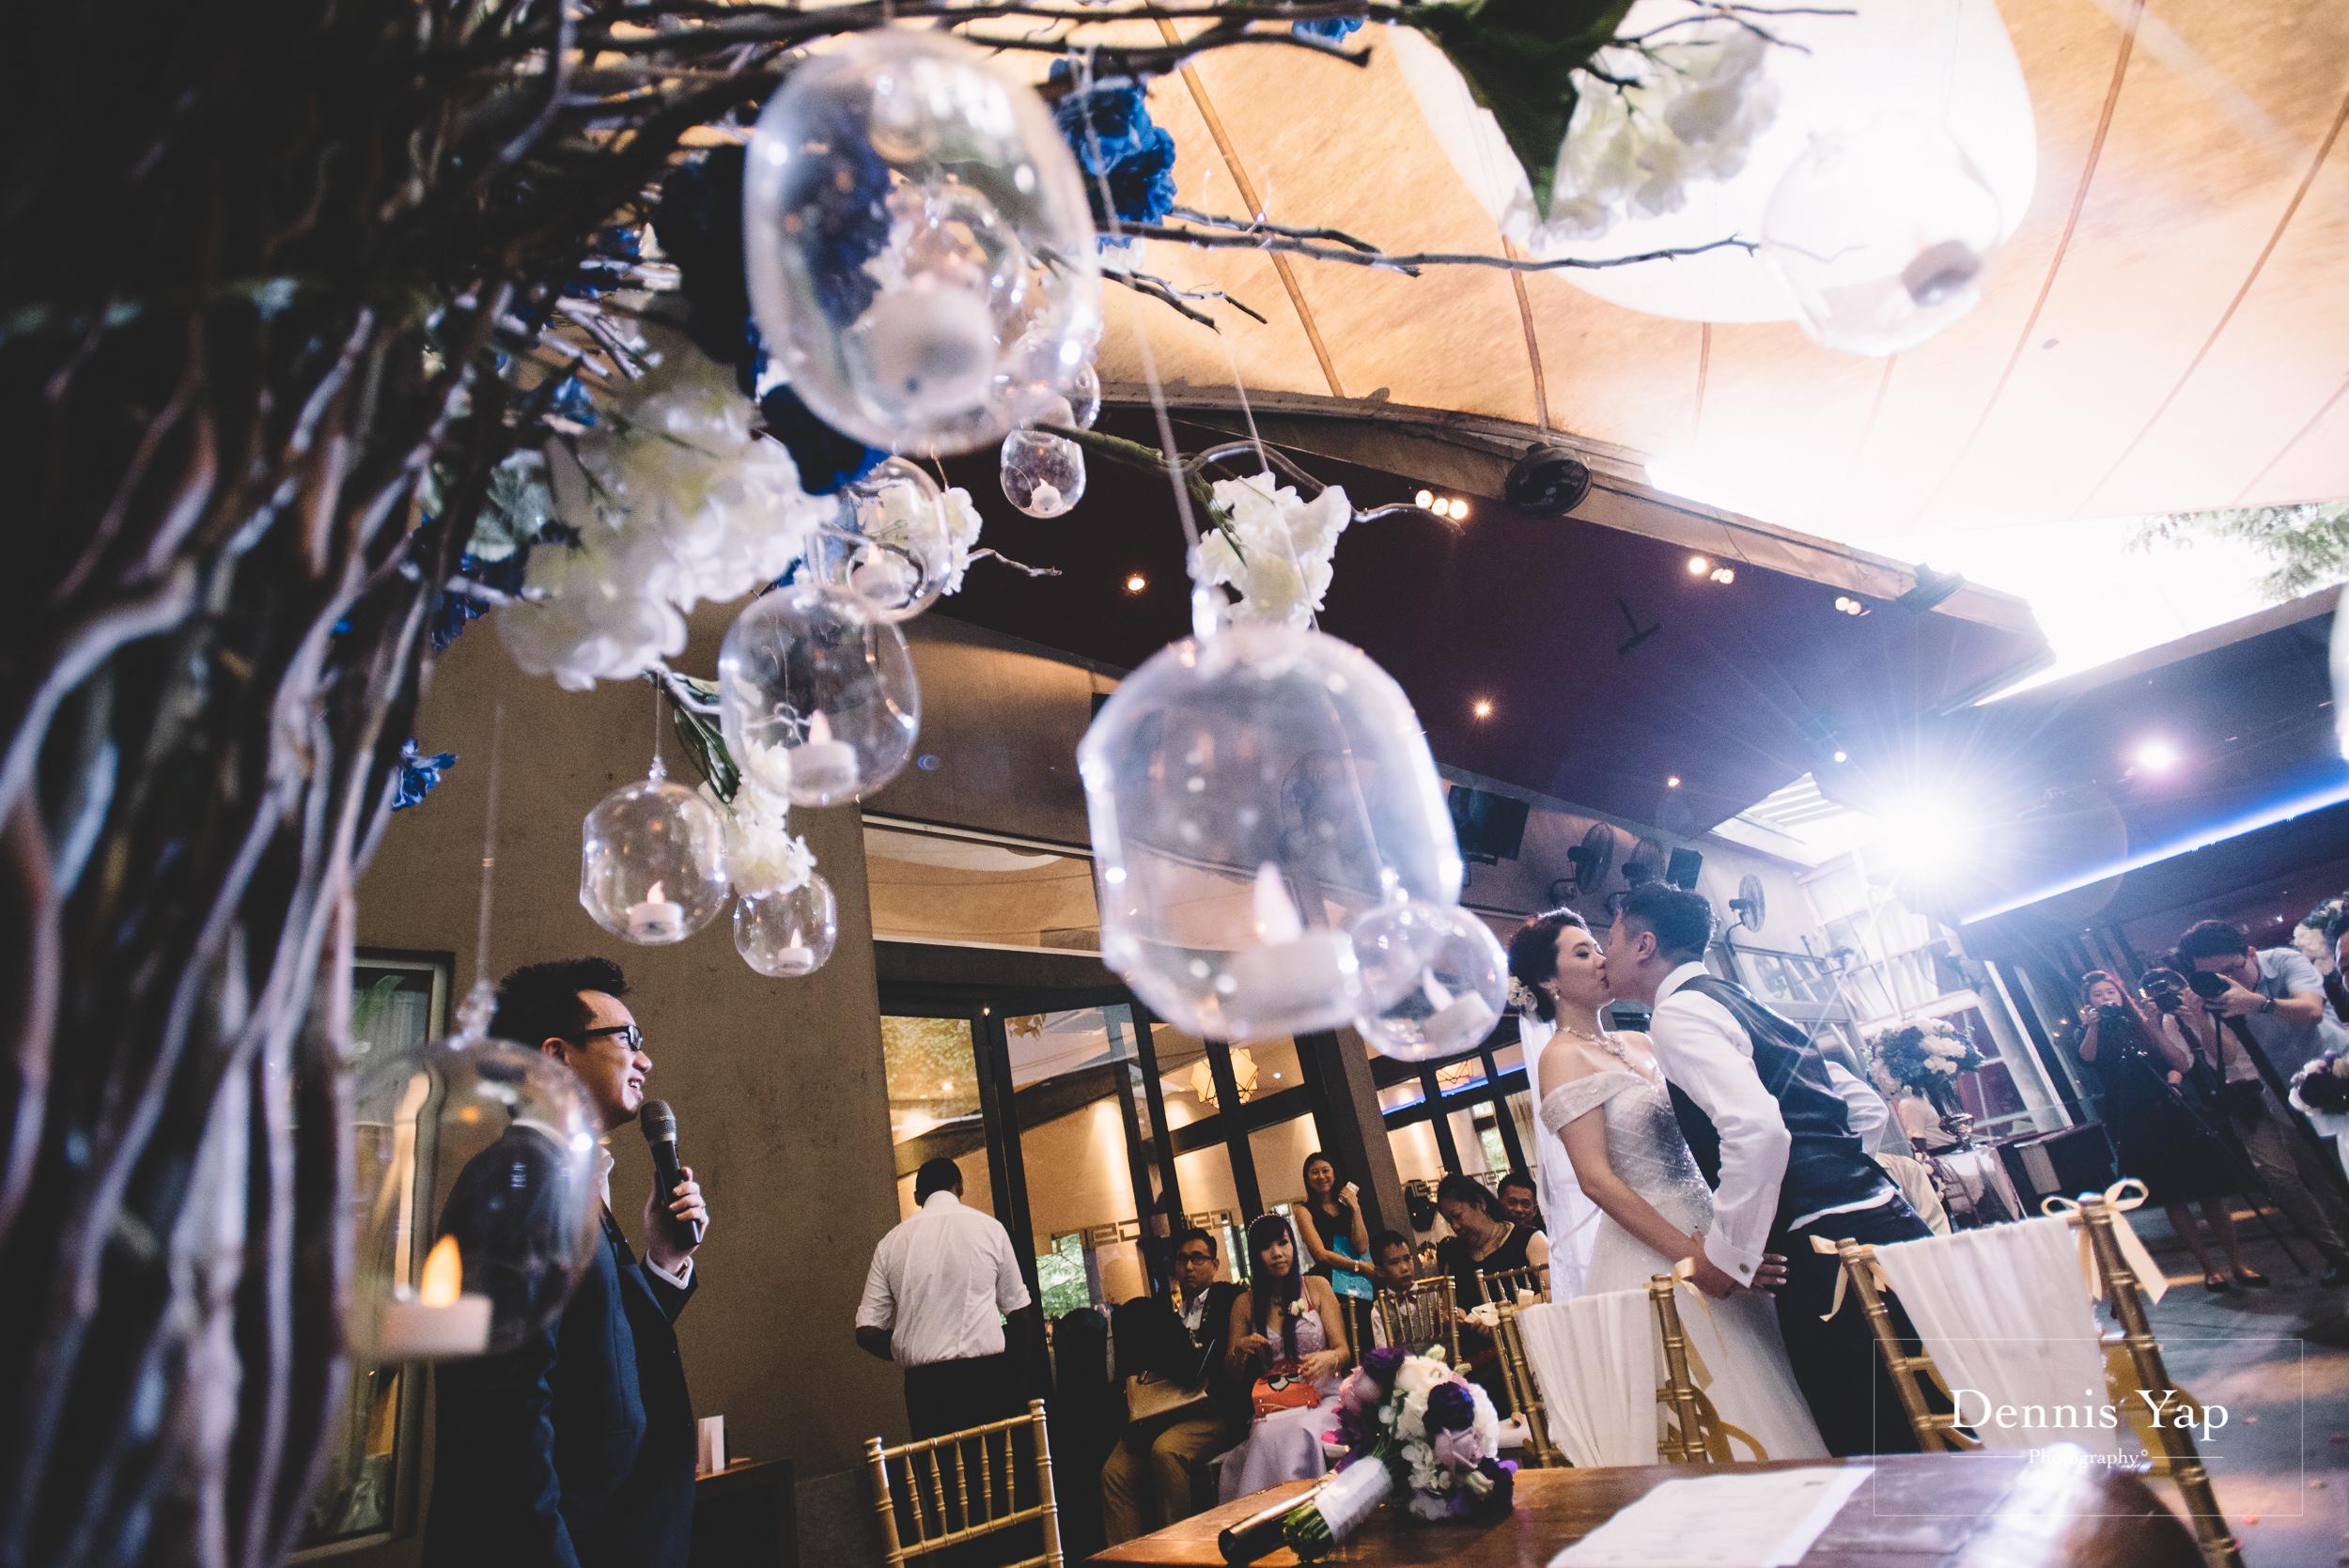 vincent peggy wedding dinner neo tamarind kuala lumpur dennis yap photography-24.jpg